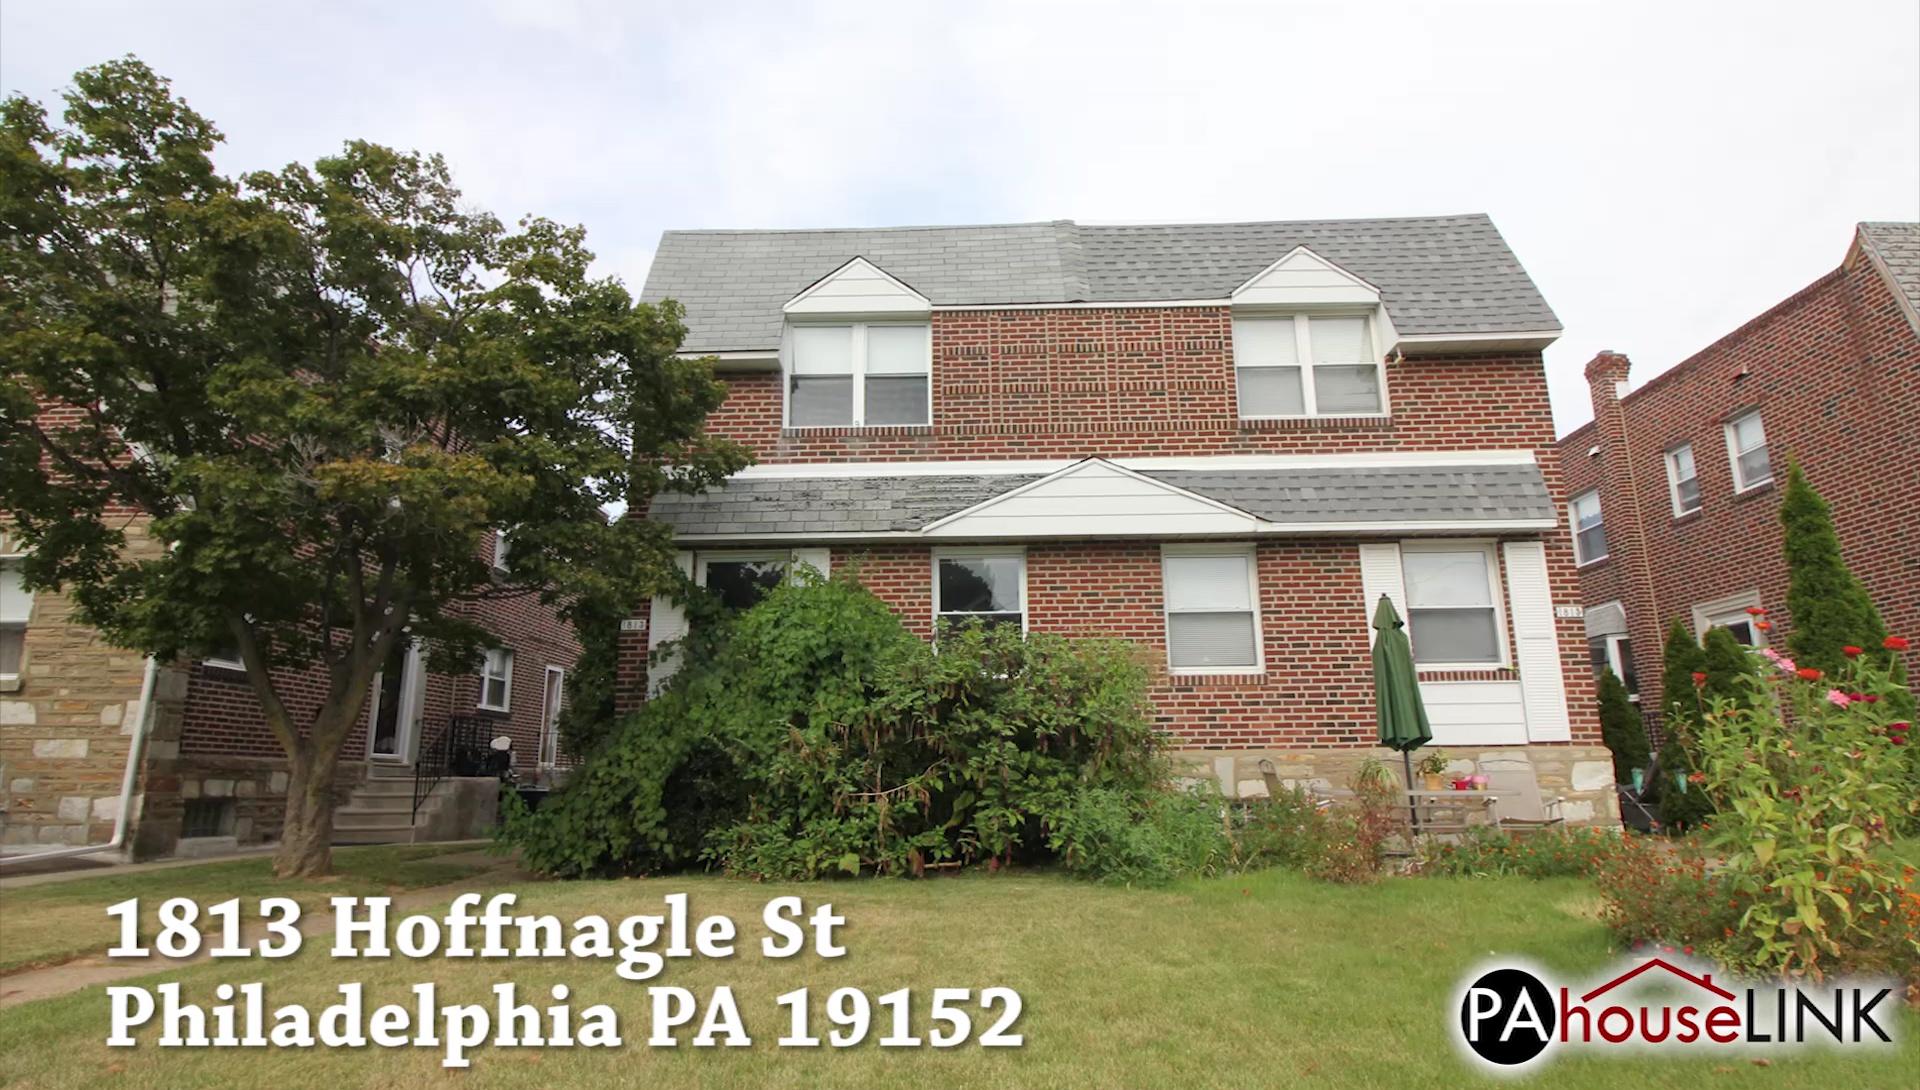 1813 Hoffnagle St Philadelphia PA 19152 | Coming Soon Foreclosure Properties Philadelphia PA 19152